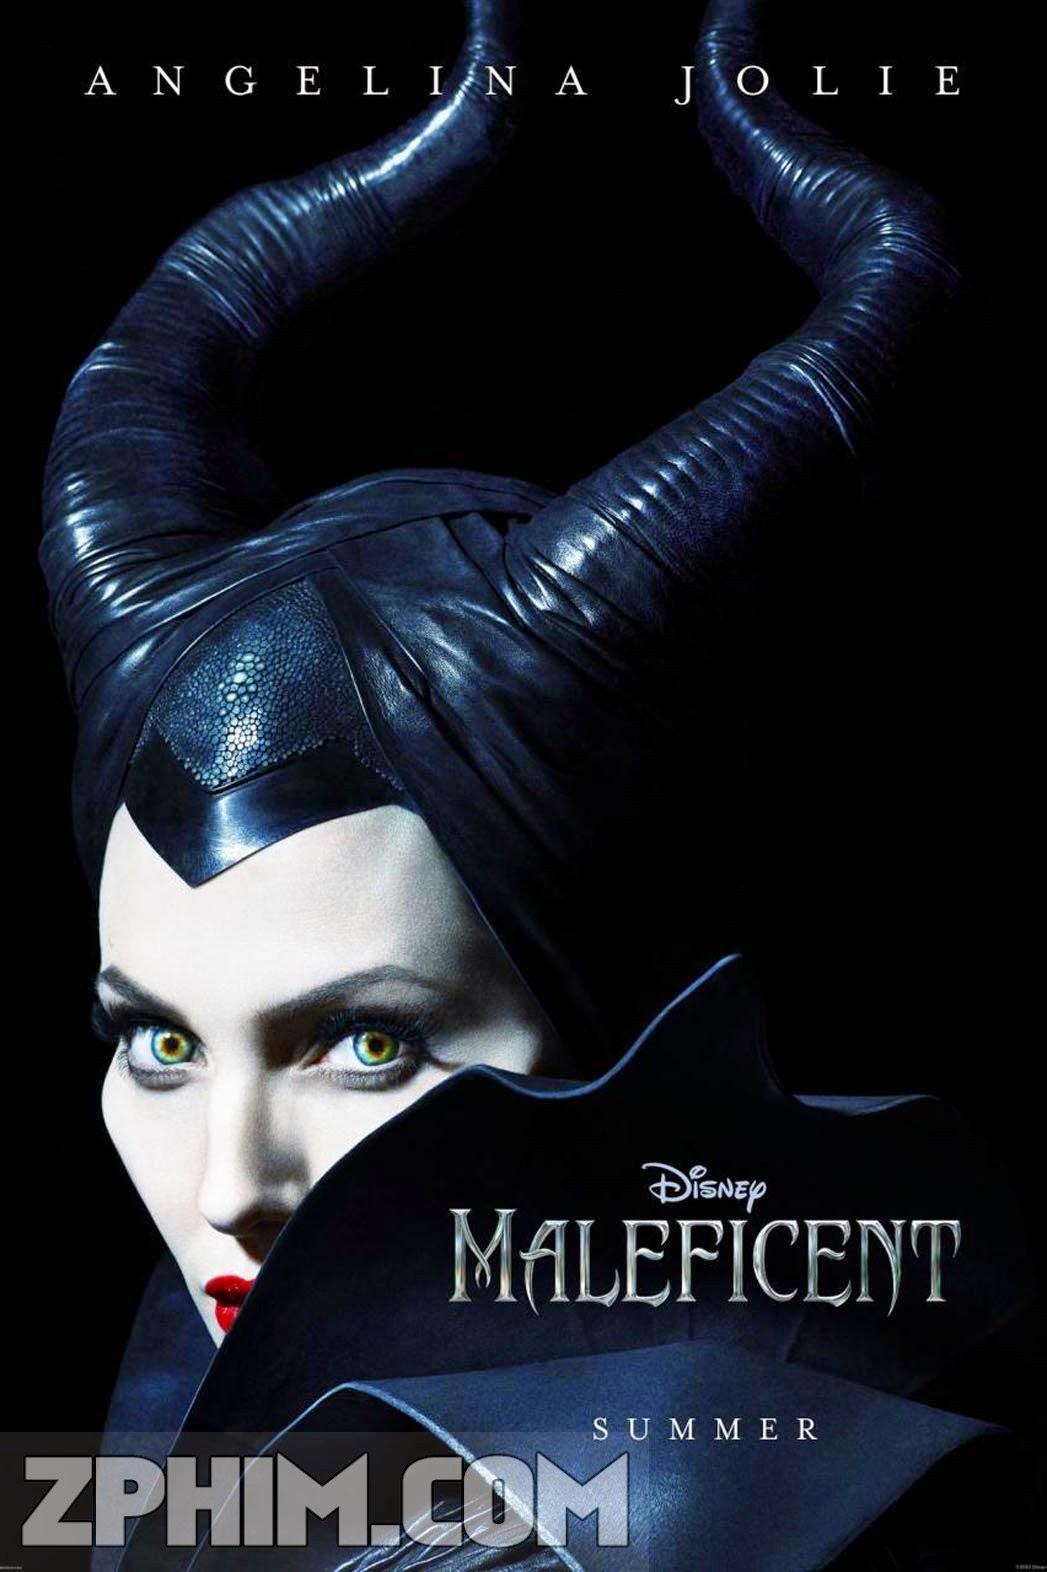 Tiên Hắc Ám - Maleficent (2014) Poster